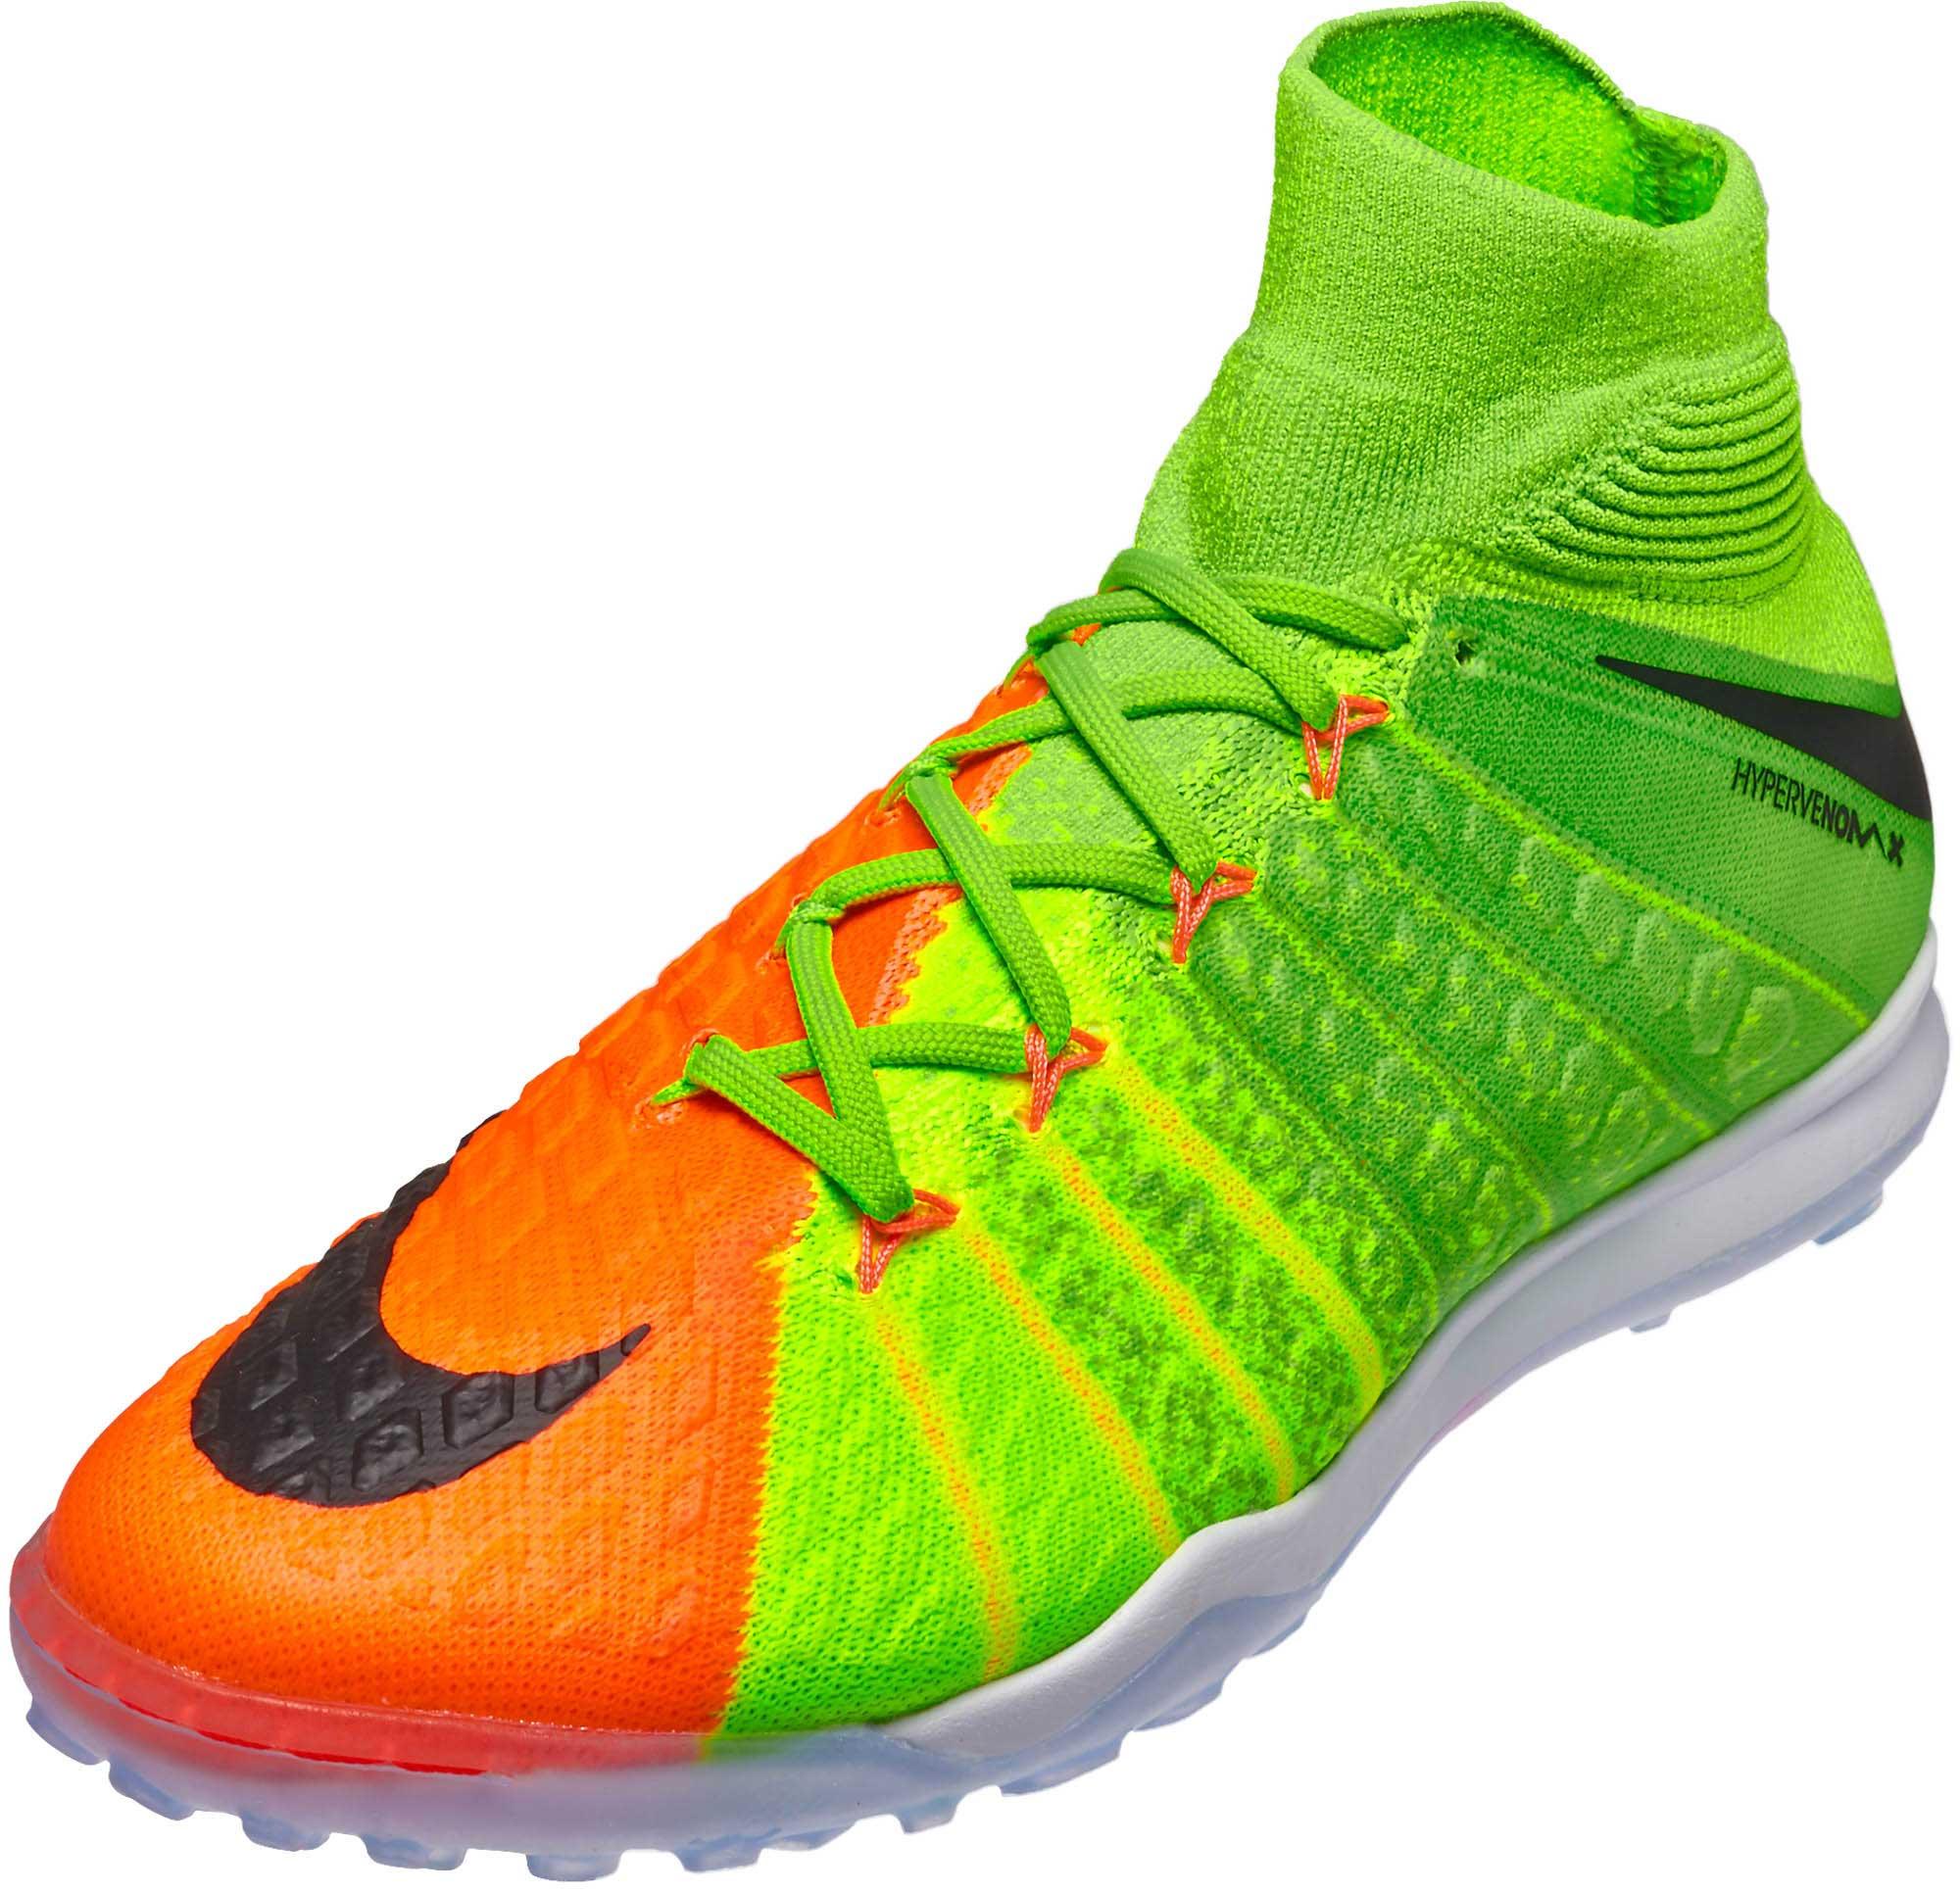 fe74aed8e91 Nike HypervenomX Proximo II TF – Electric Green Hyper Orange